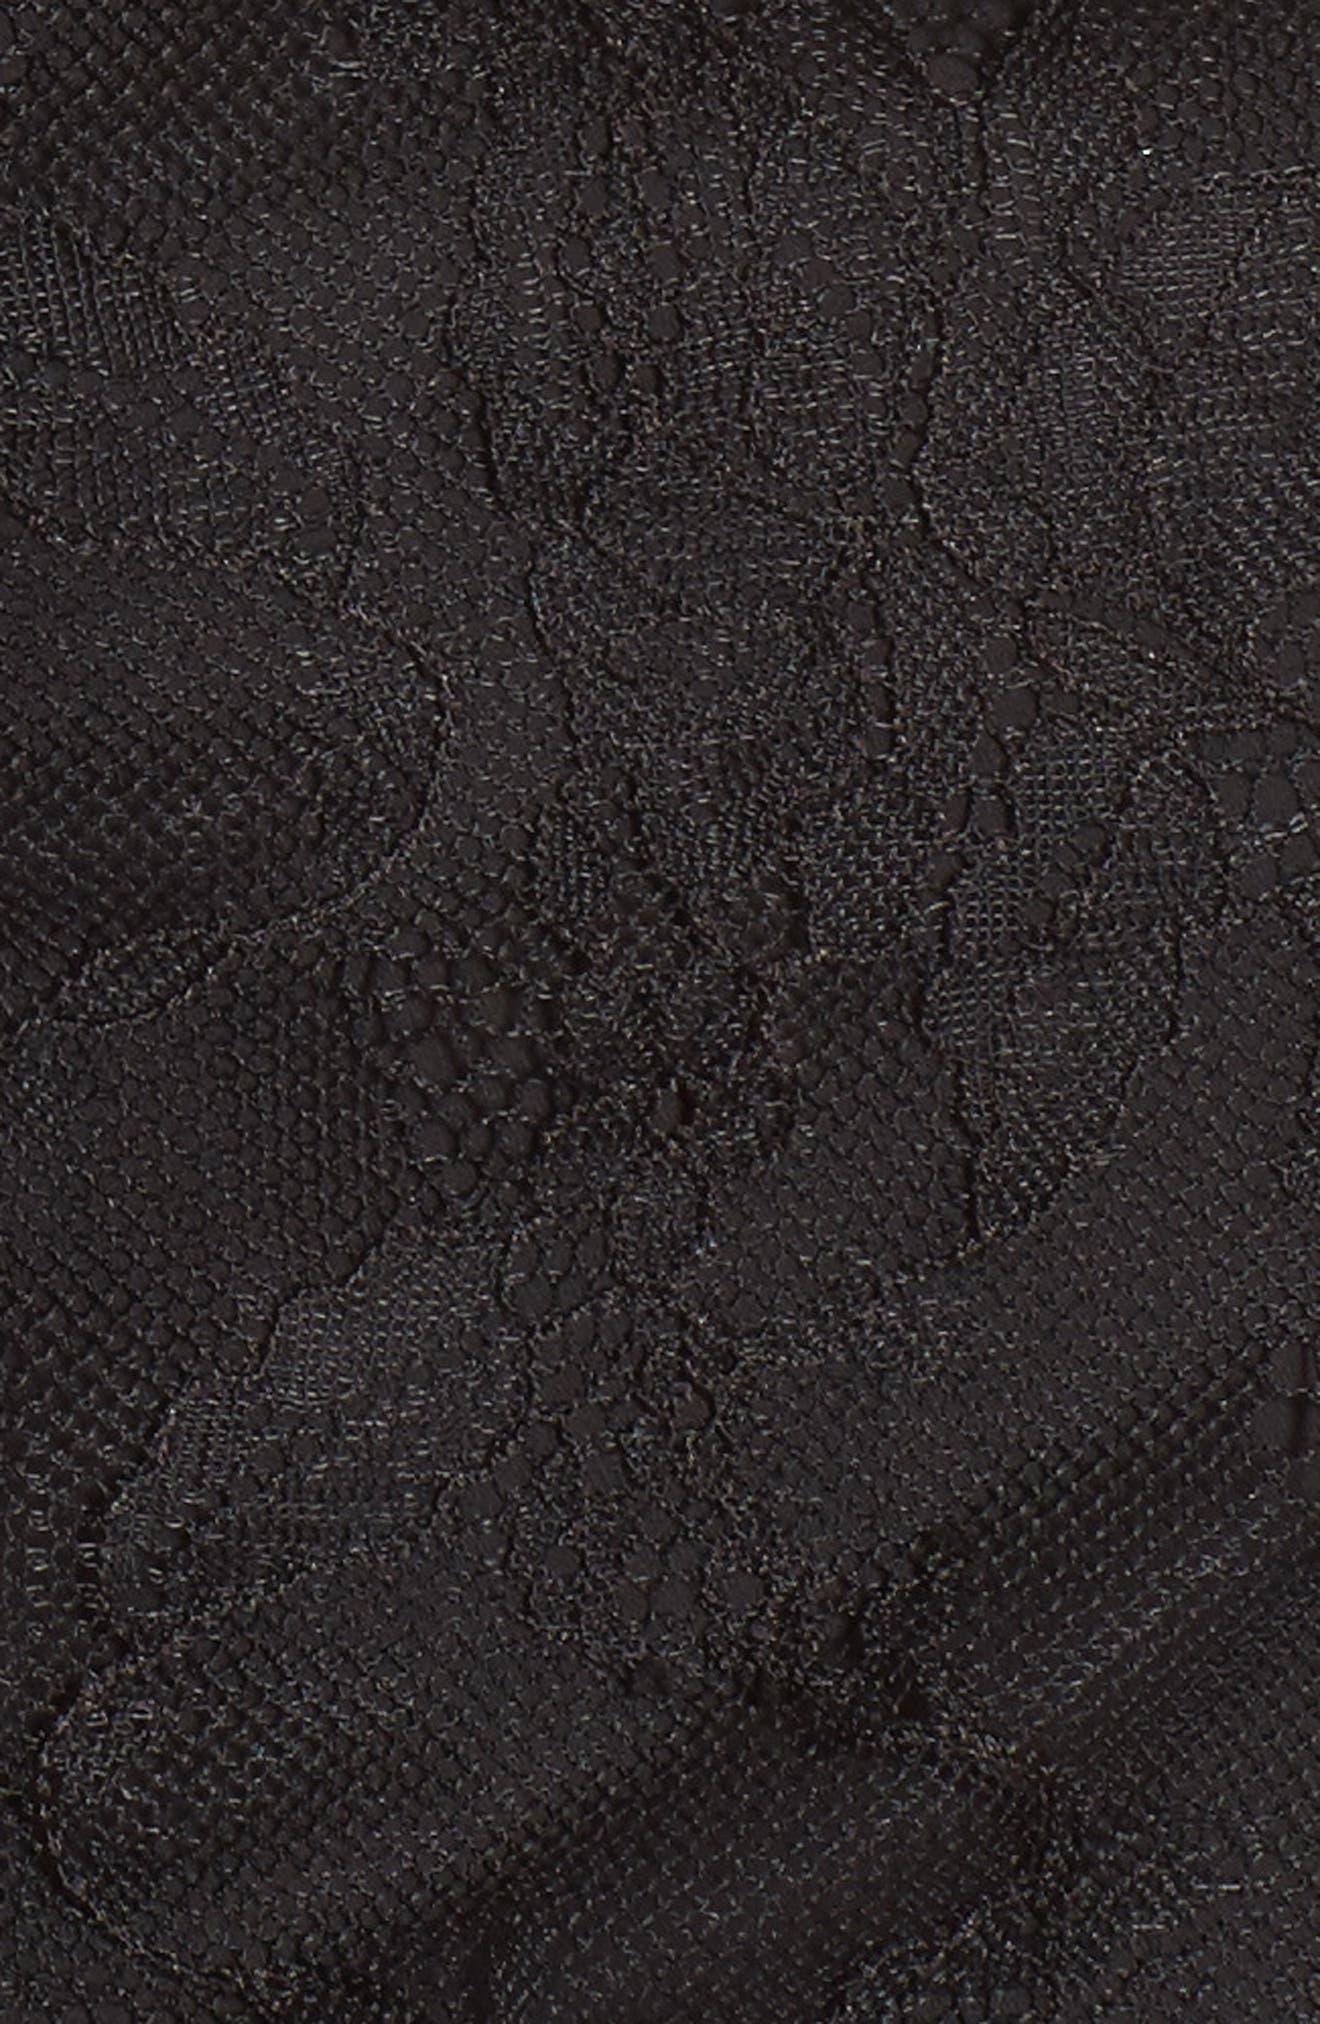 Gianna Ruffle Lace Top,                             Alternate thumbnail 5, color,                             Noir